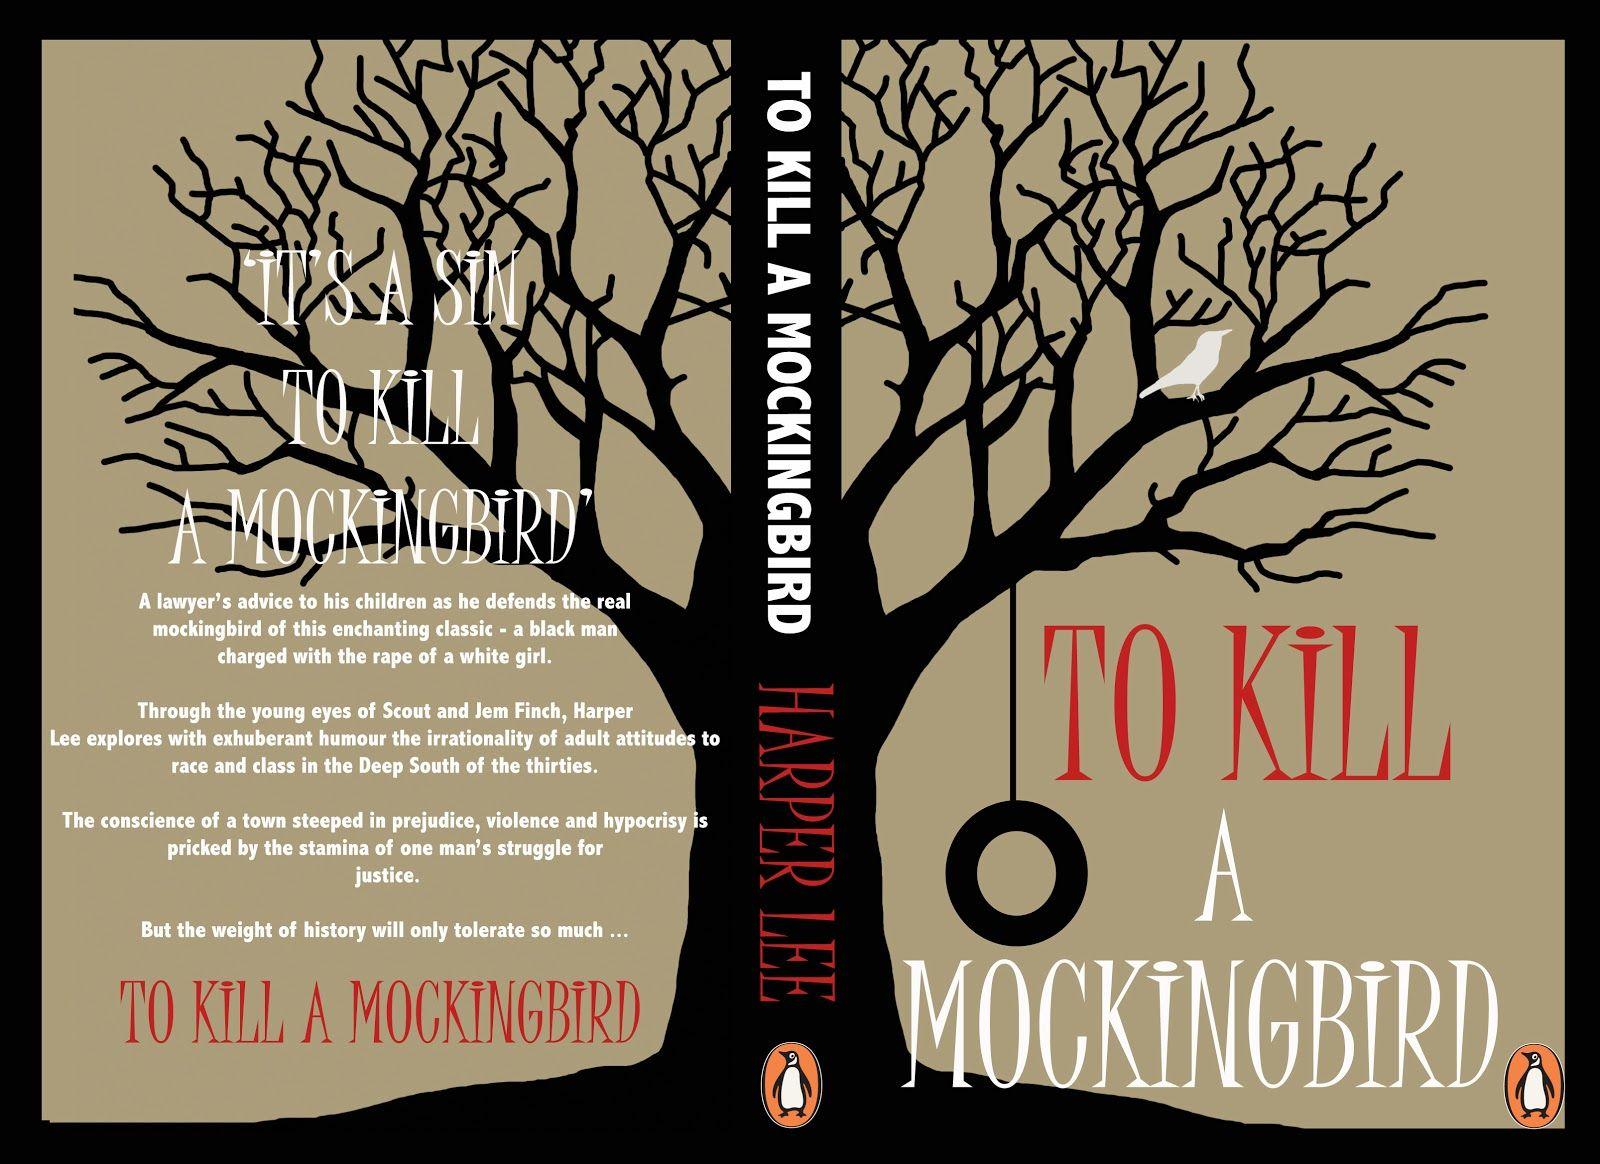 essay on to kill a mockingbird justice sappho essay essay on to kill a mockingbird justice